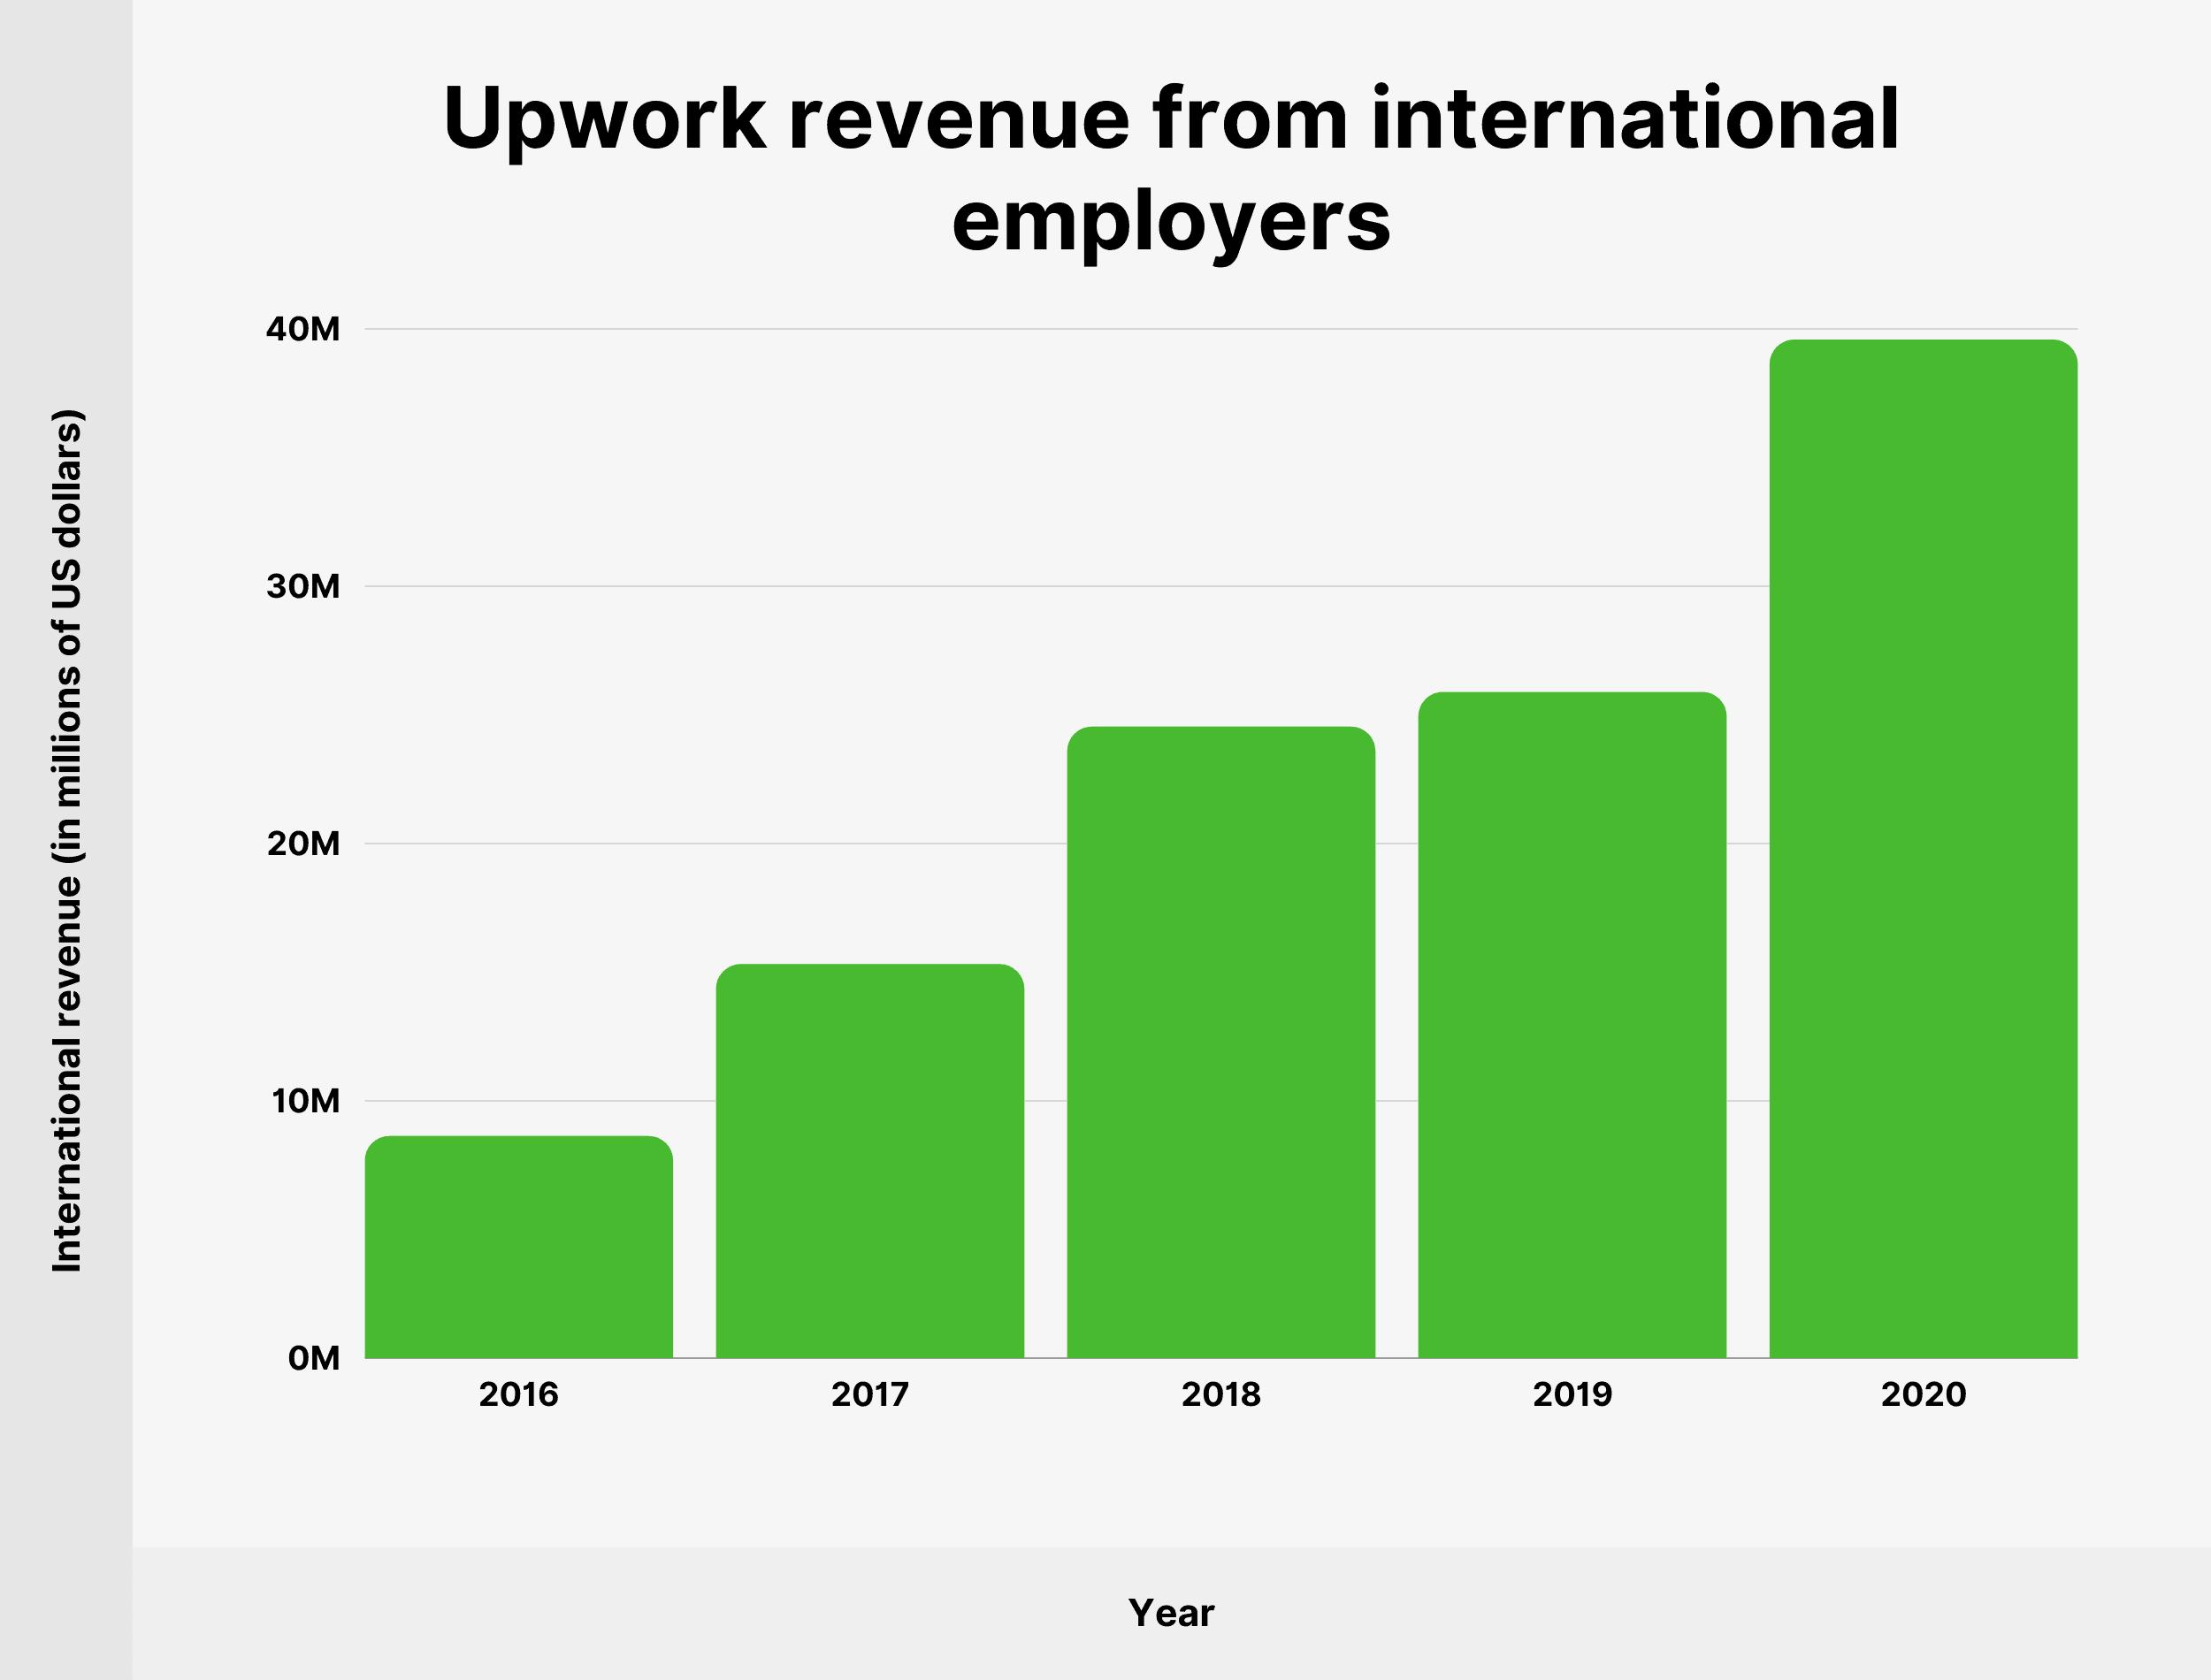 Upwork revenue from international employers